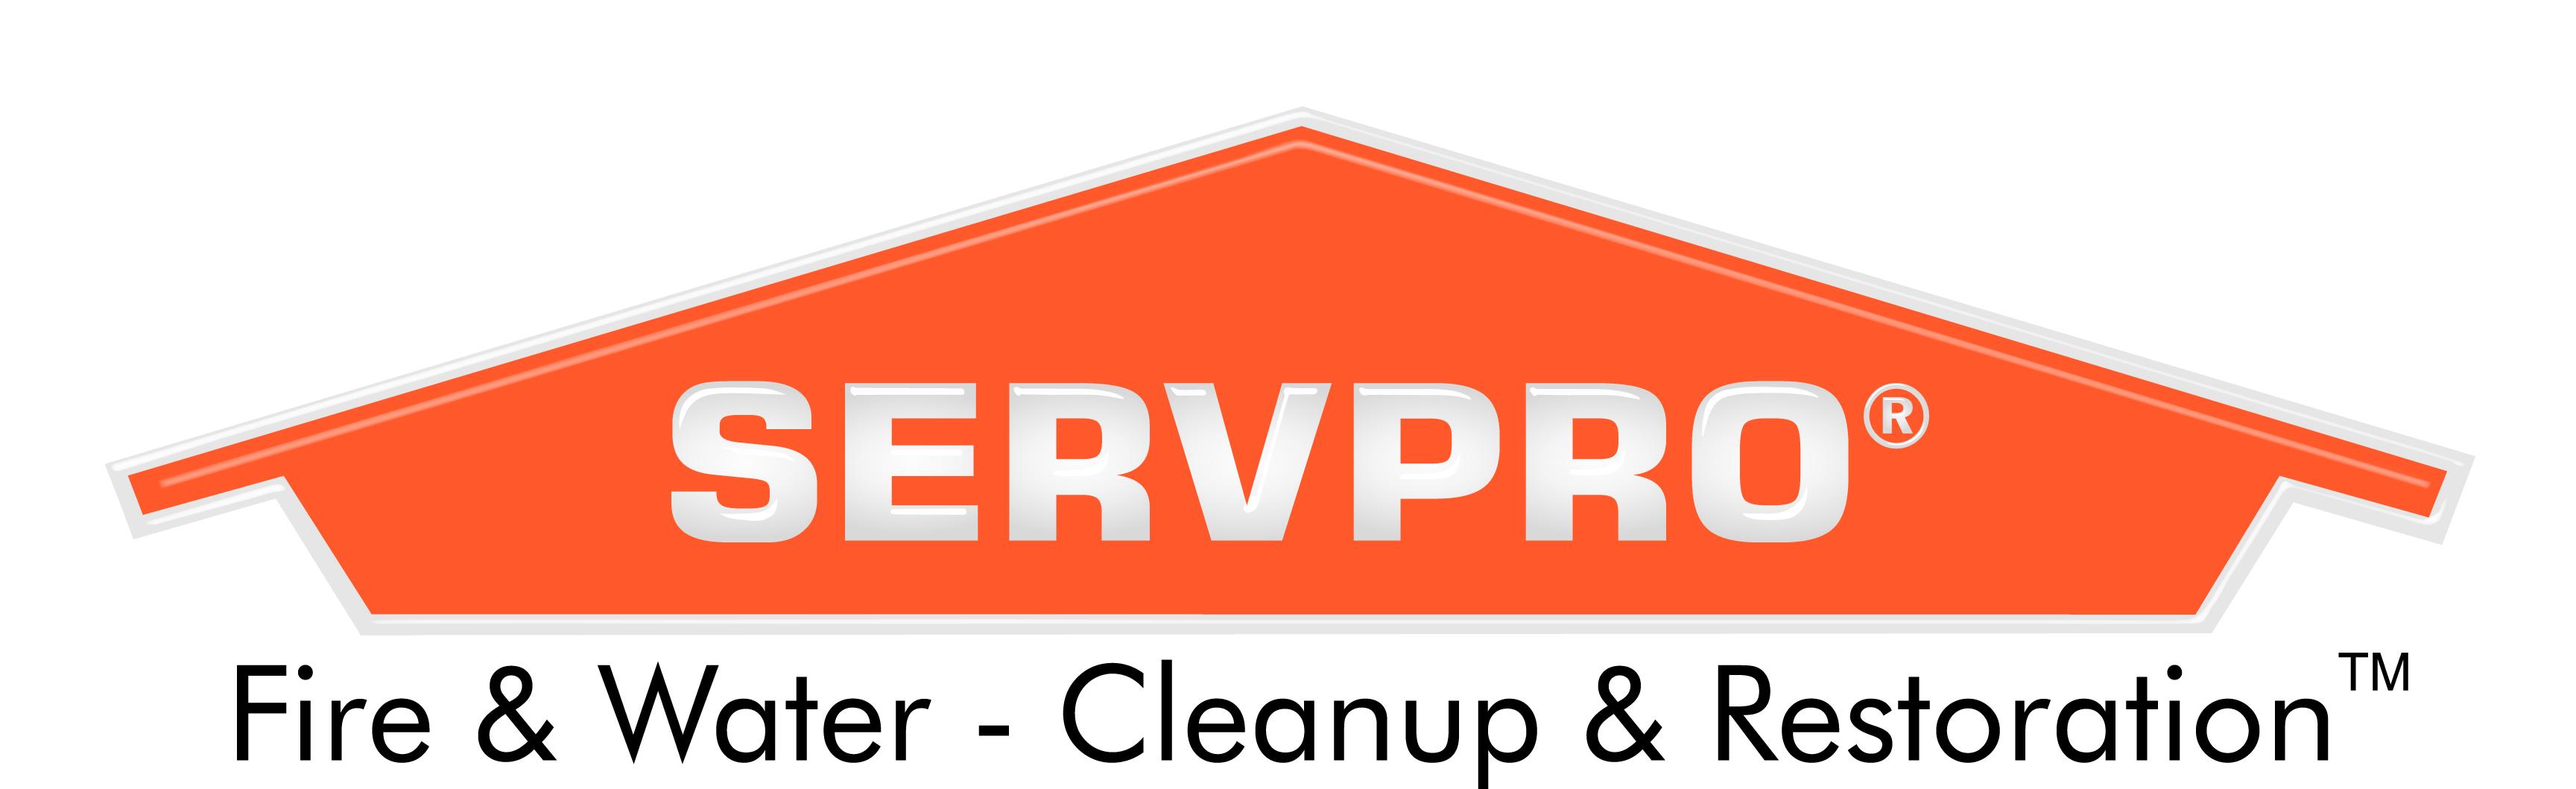 Servpro logo